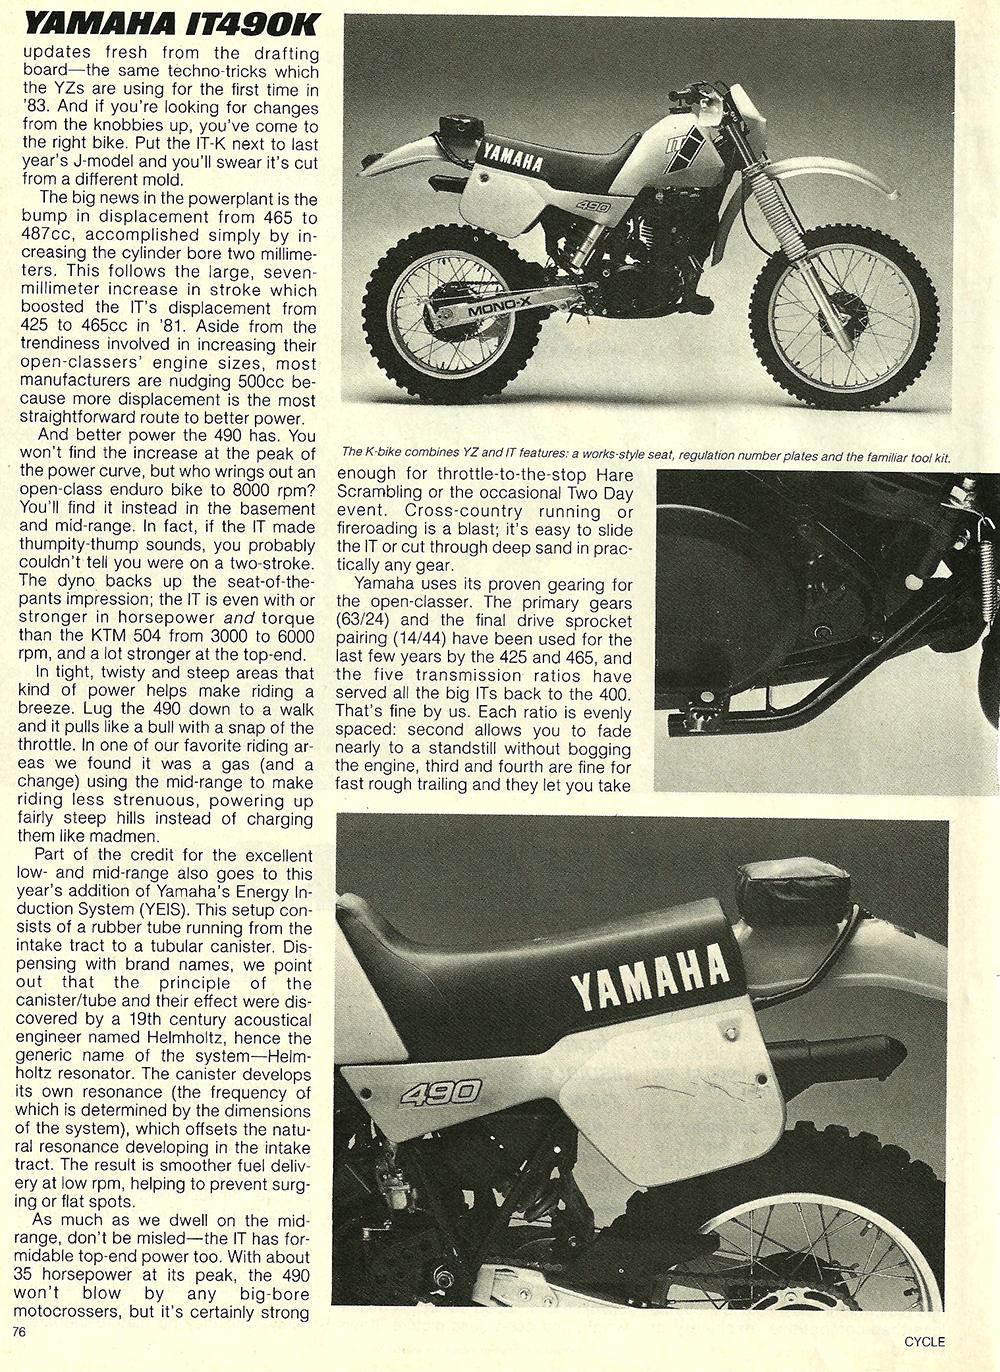 1983 Yamaha IT490K road test 2.jpg